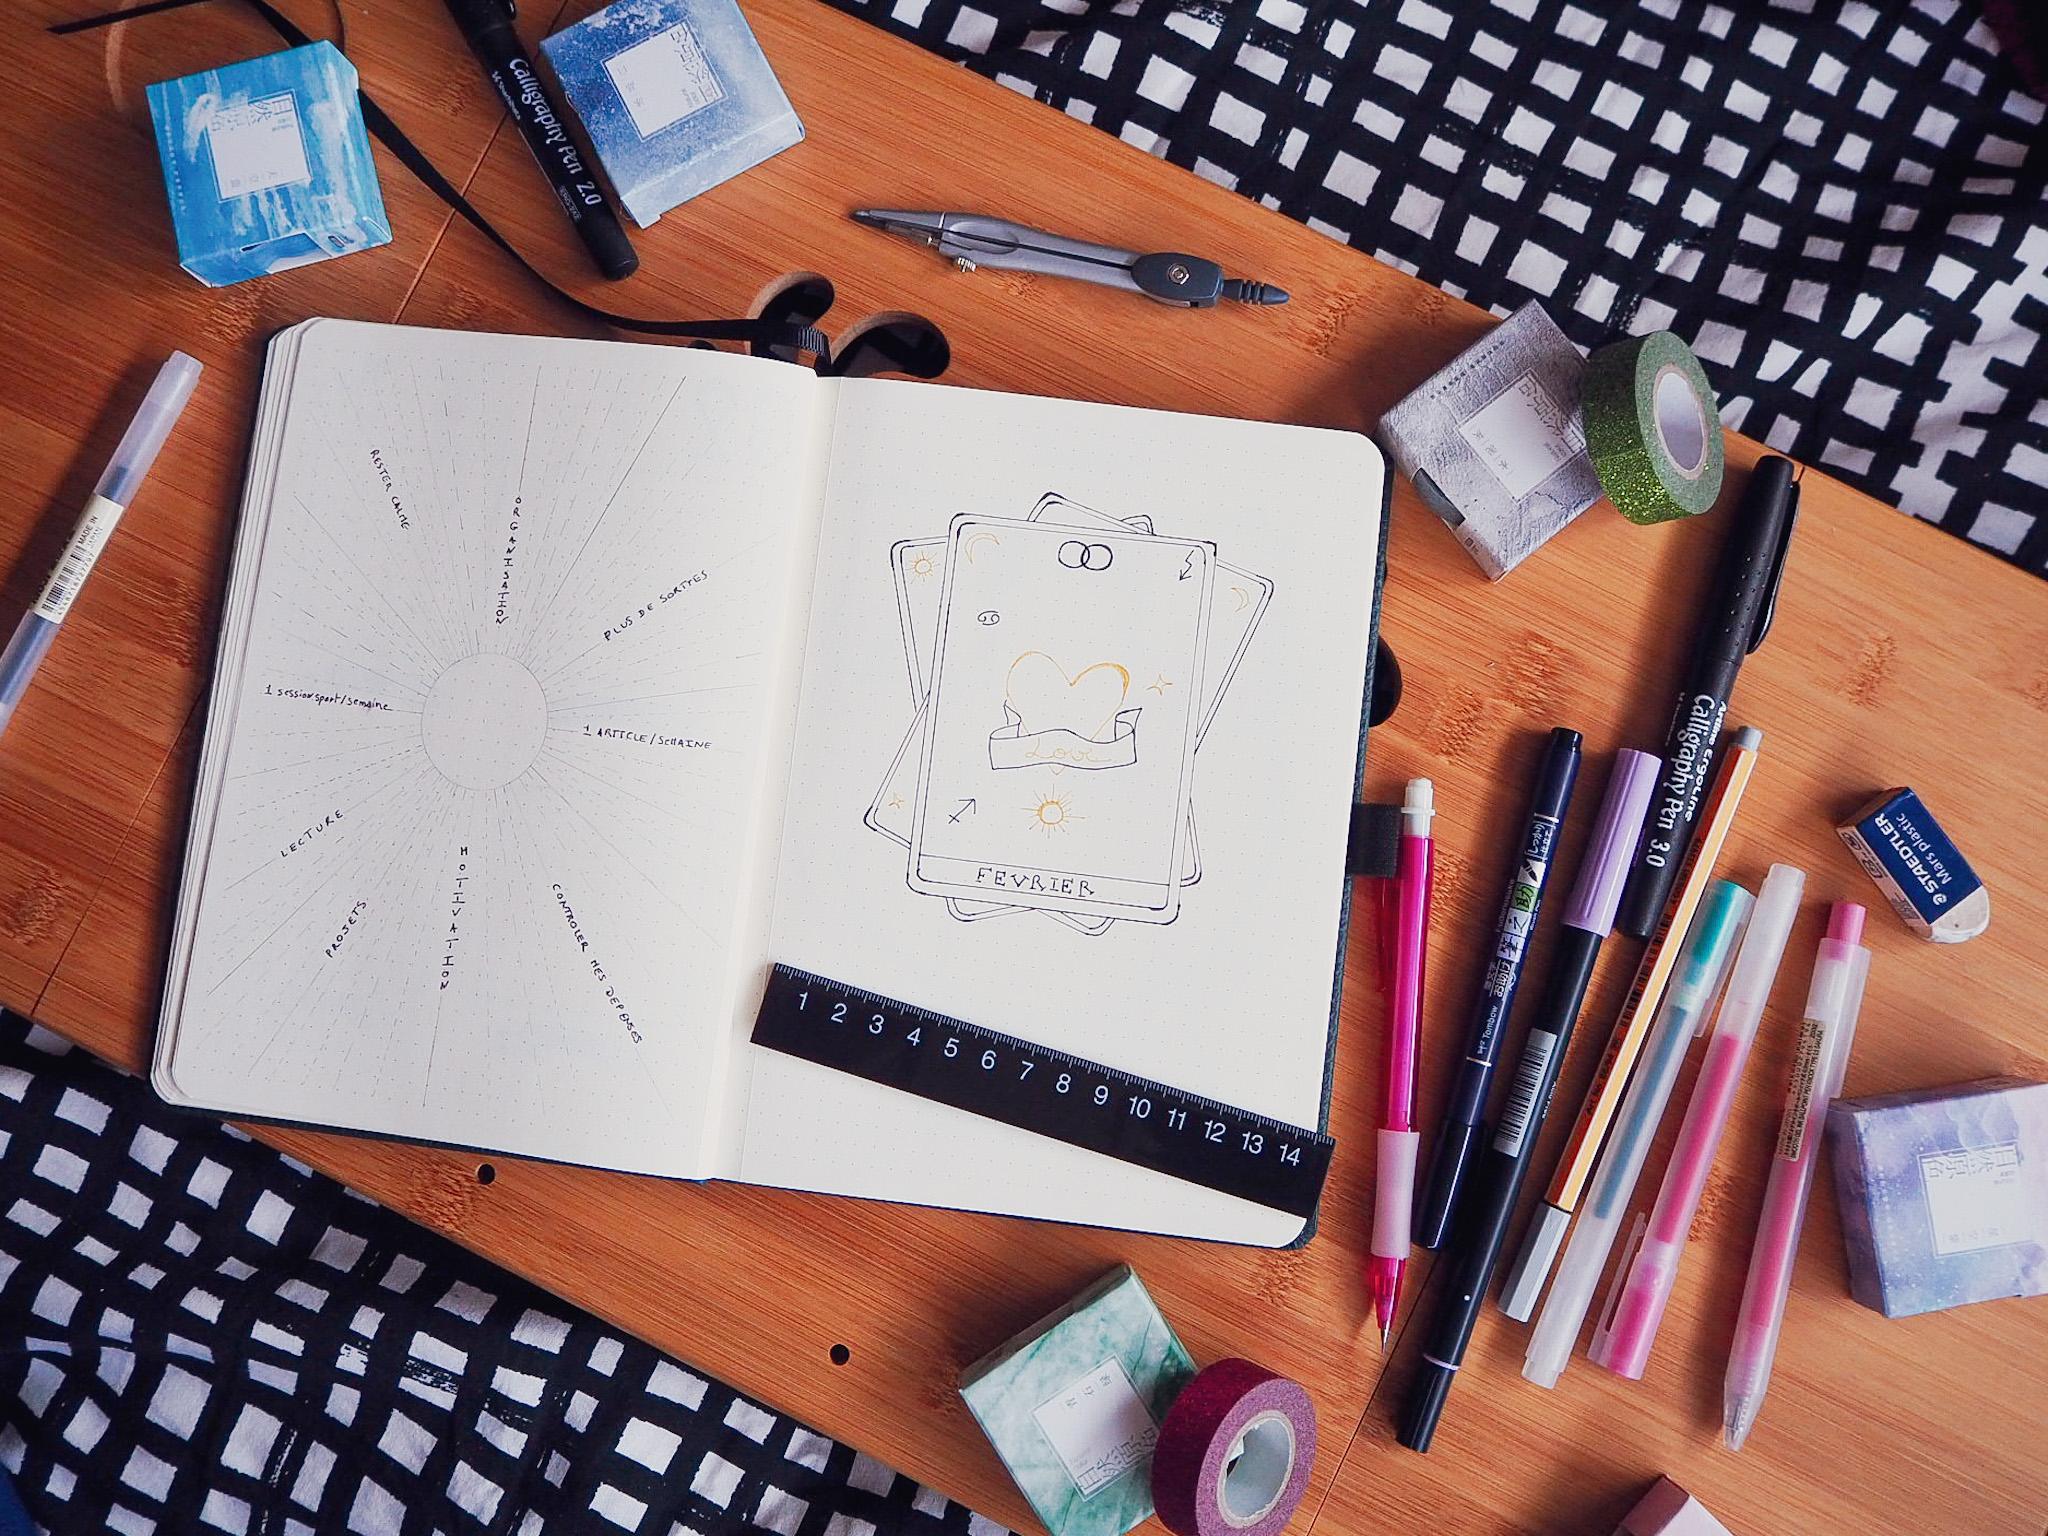 Bullet-journal-loisir-creatif-passion